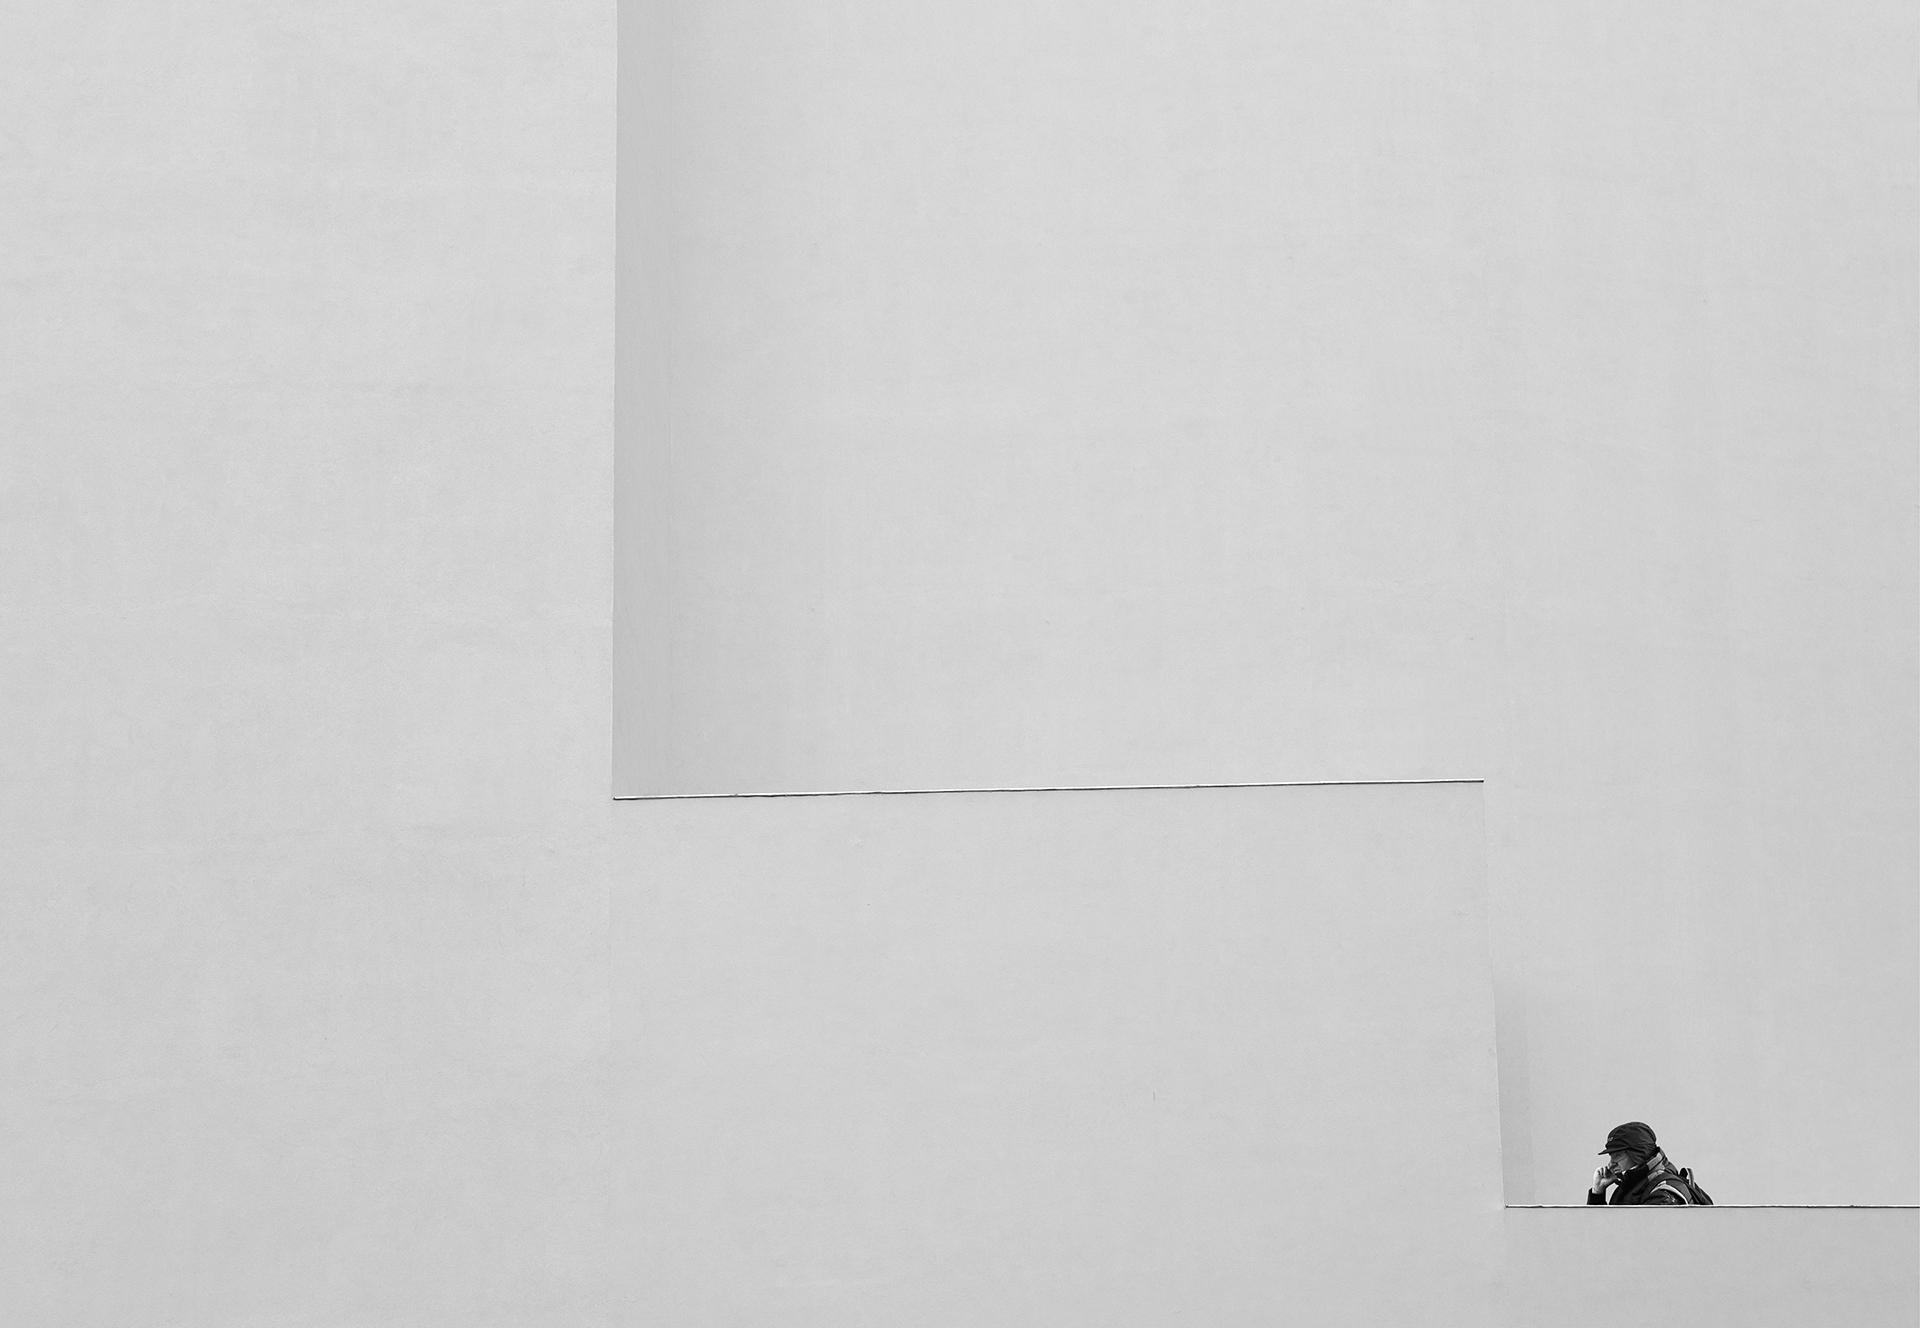 Photo in Everything else | Author Valentin Dotsev - valdo | PHOTO FORUM